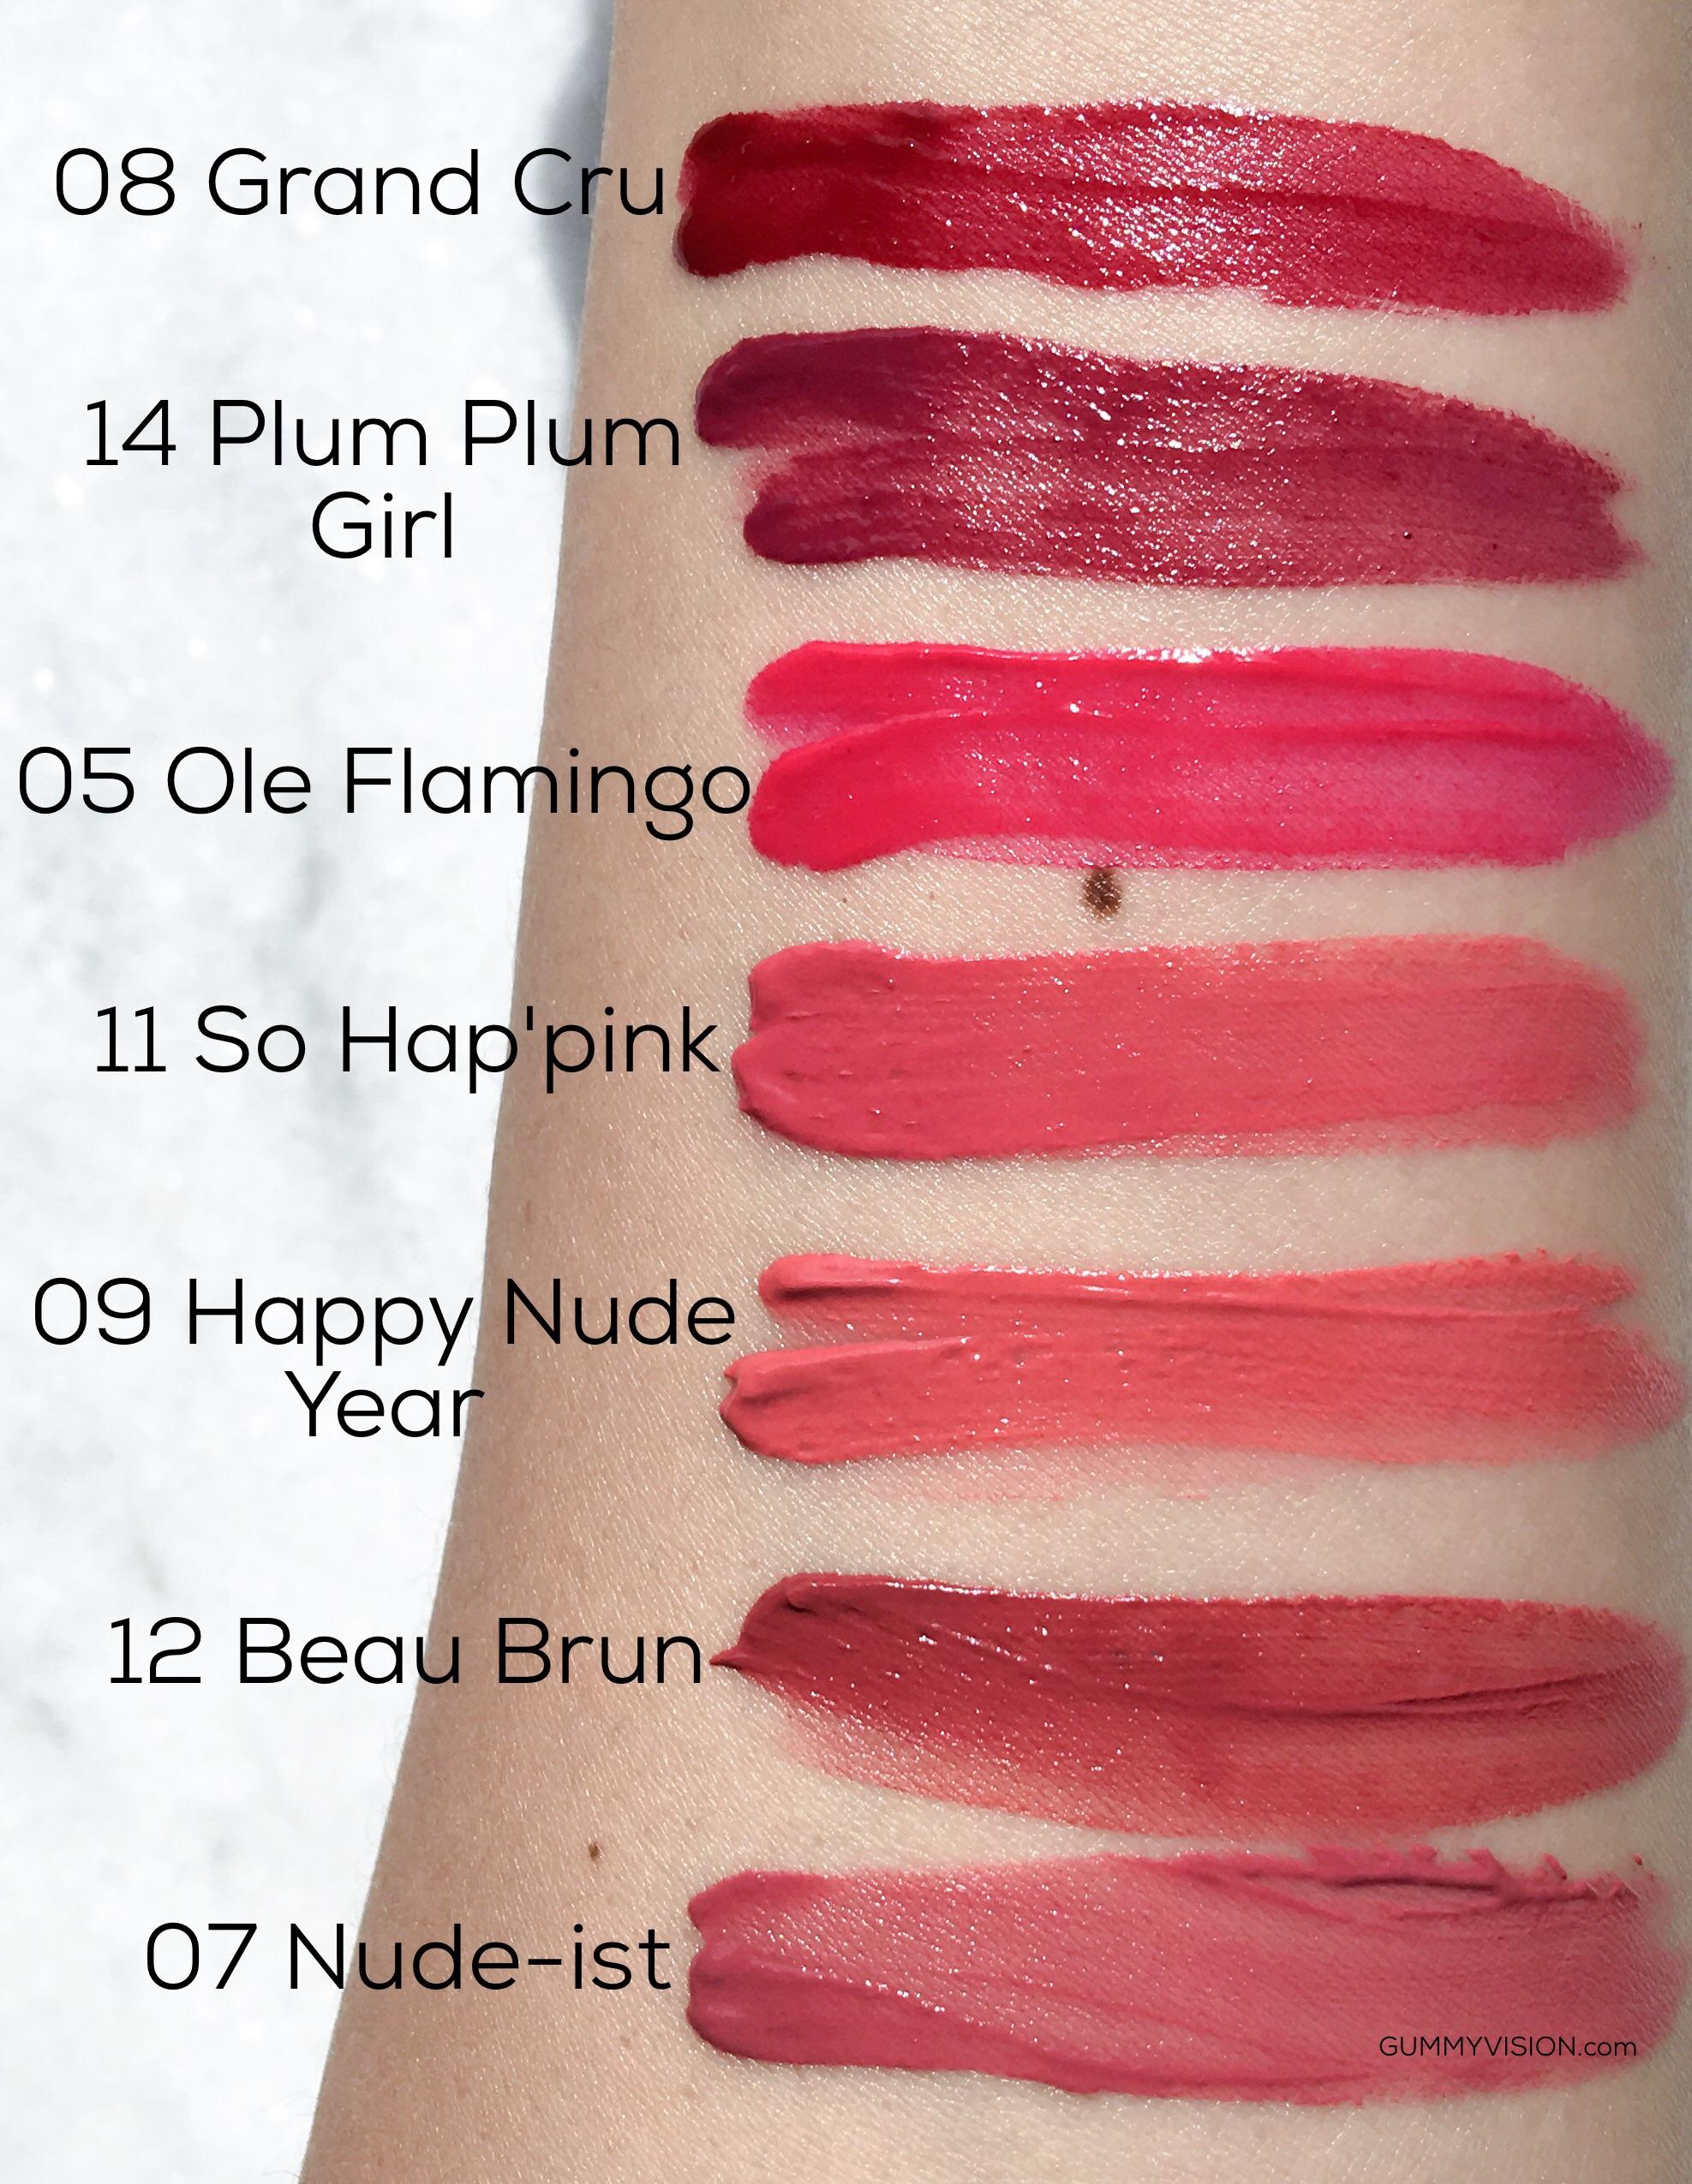 Bourjois Rouge Edition Velvet Lipsticks (Bottom to Top): 07 Nude-ist, 12 Beau Brun, 09 Happy Nude-Year, 11 So Hap'pink, 05 Ole Flamingo, 14 Plum Plum Girl, 08 Grand Cru